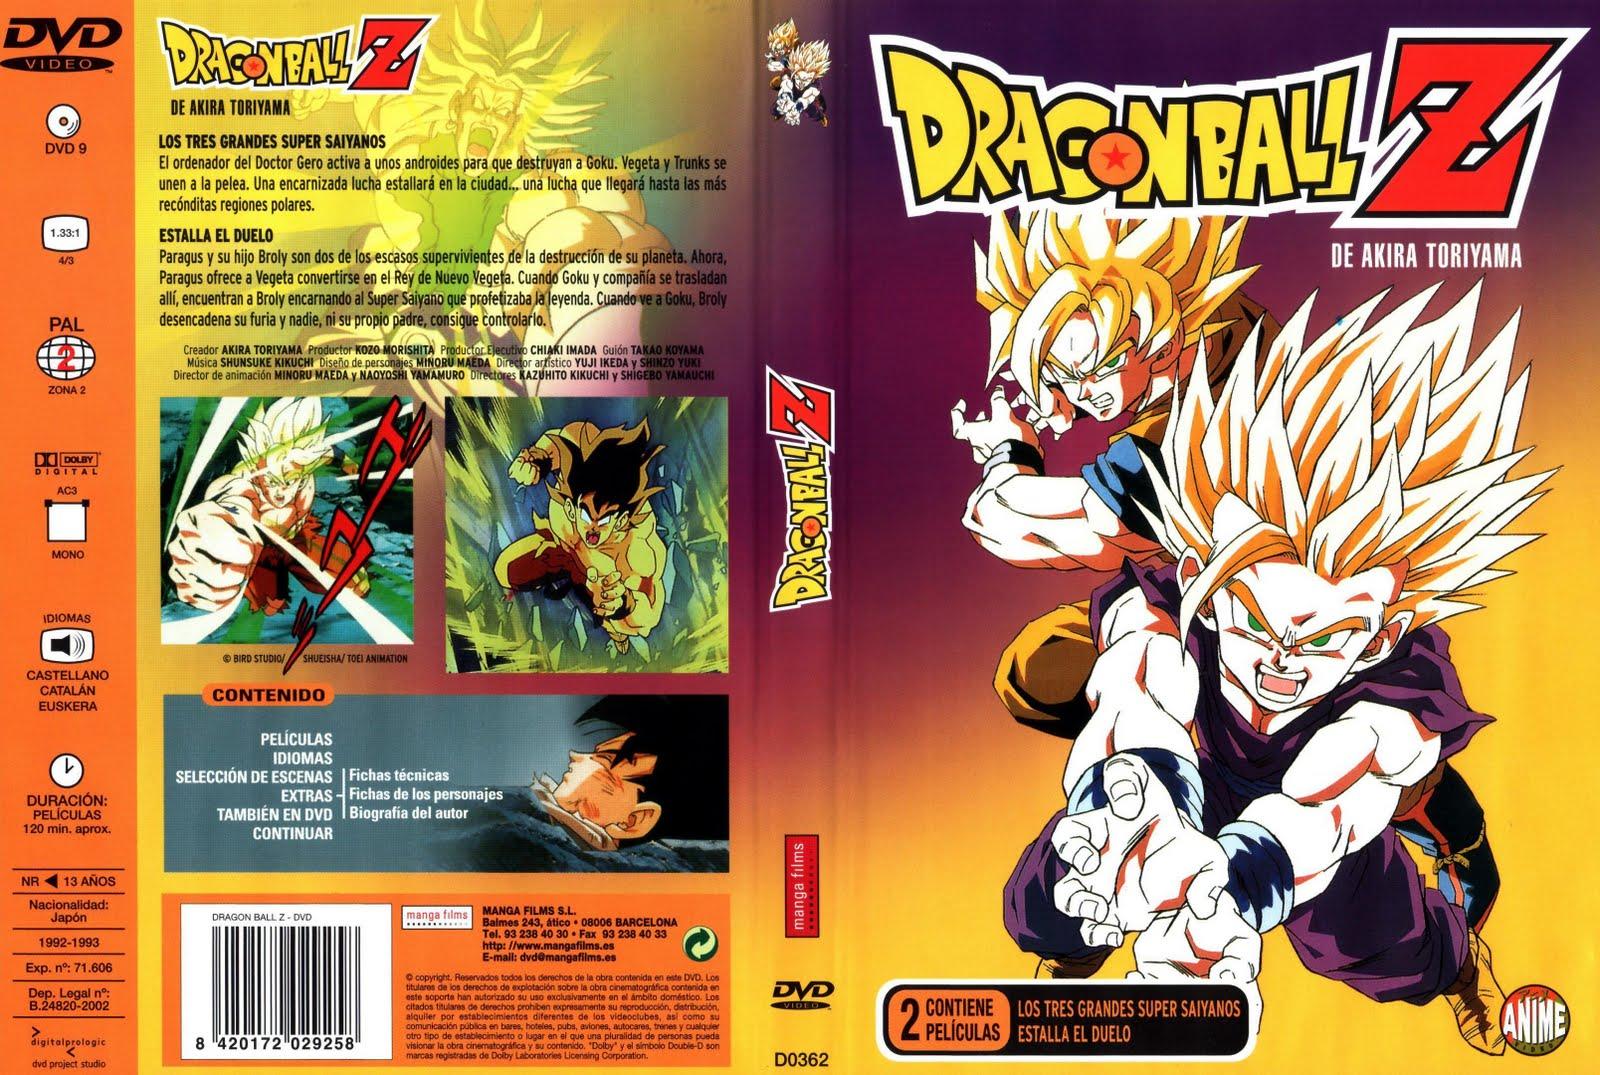 Etiquetas: Caratulas DVD Dragon Ball Z Las Peliculas Manga Films